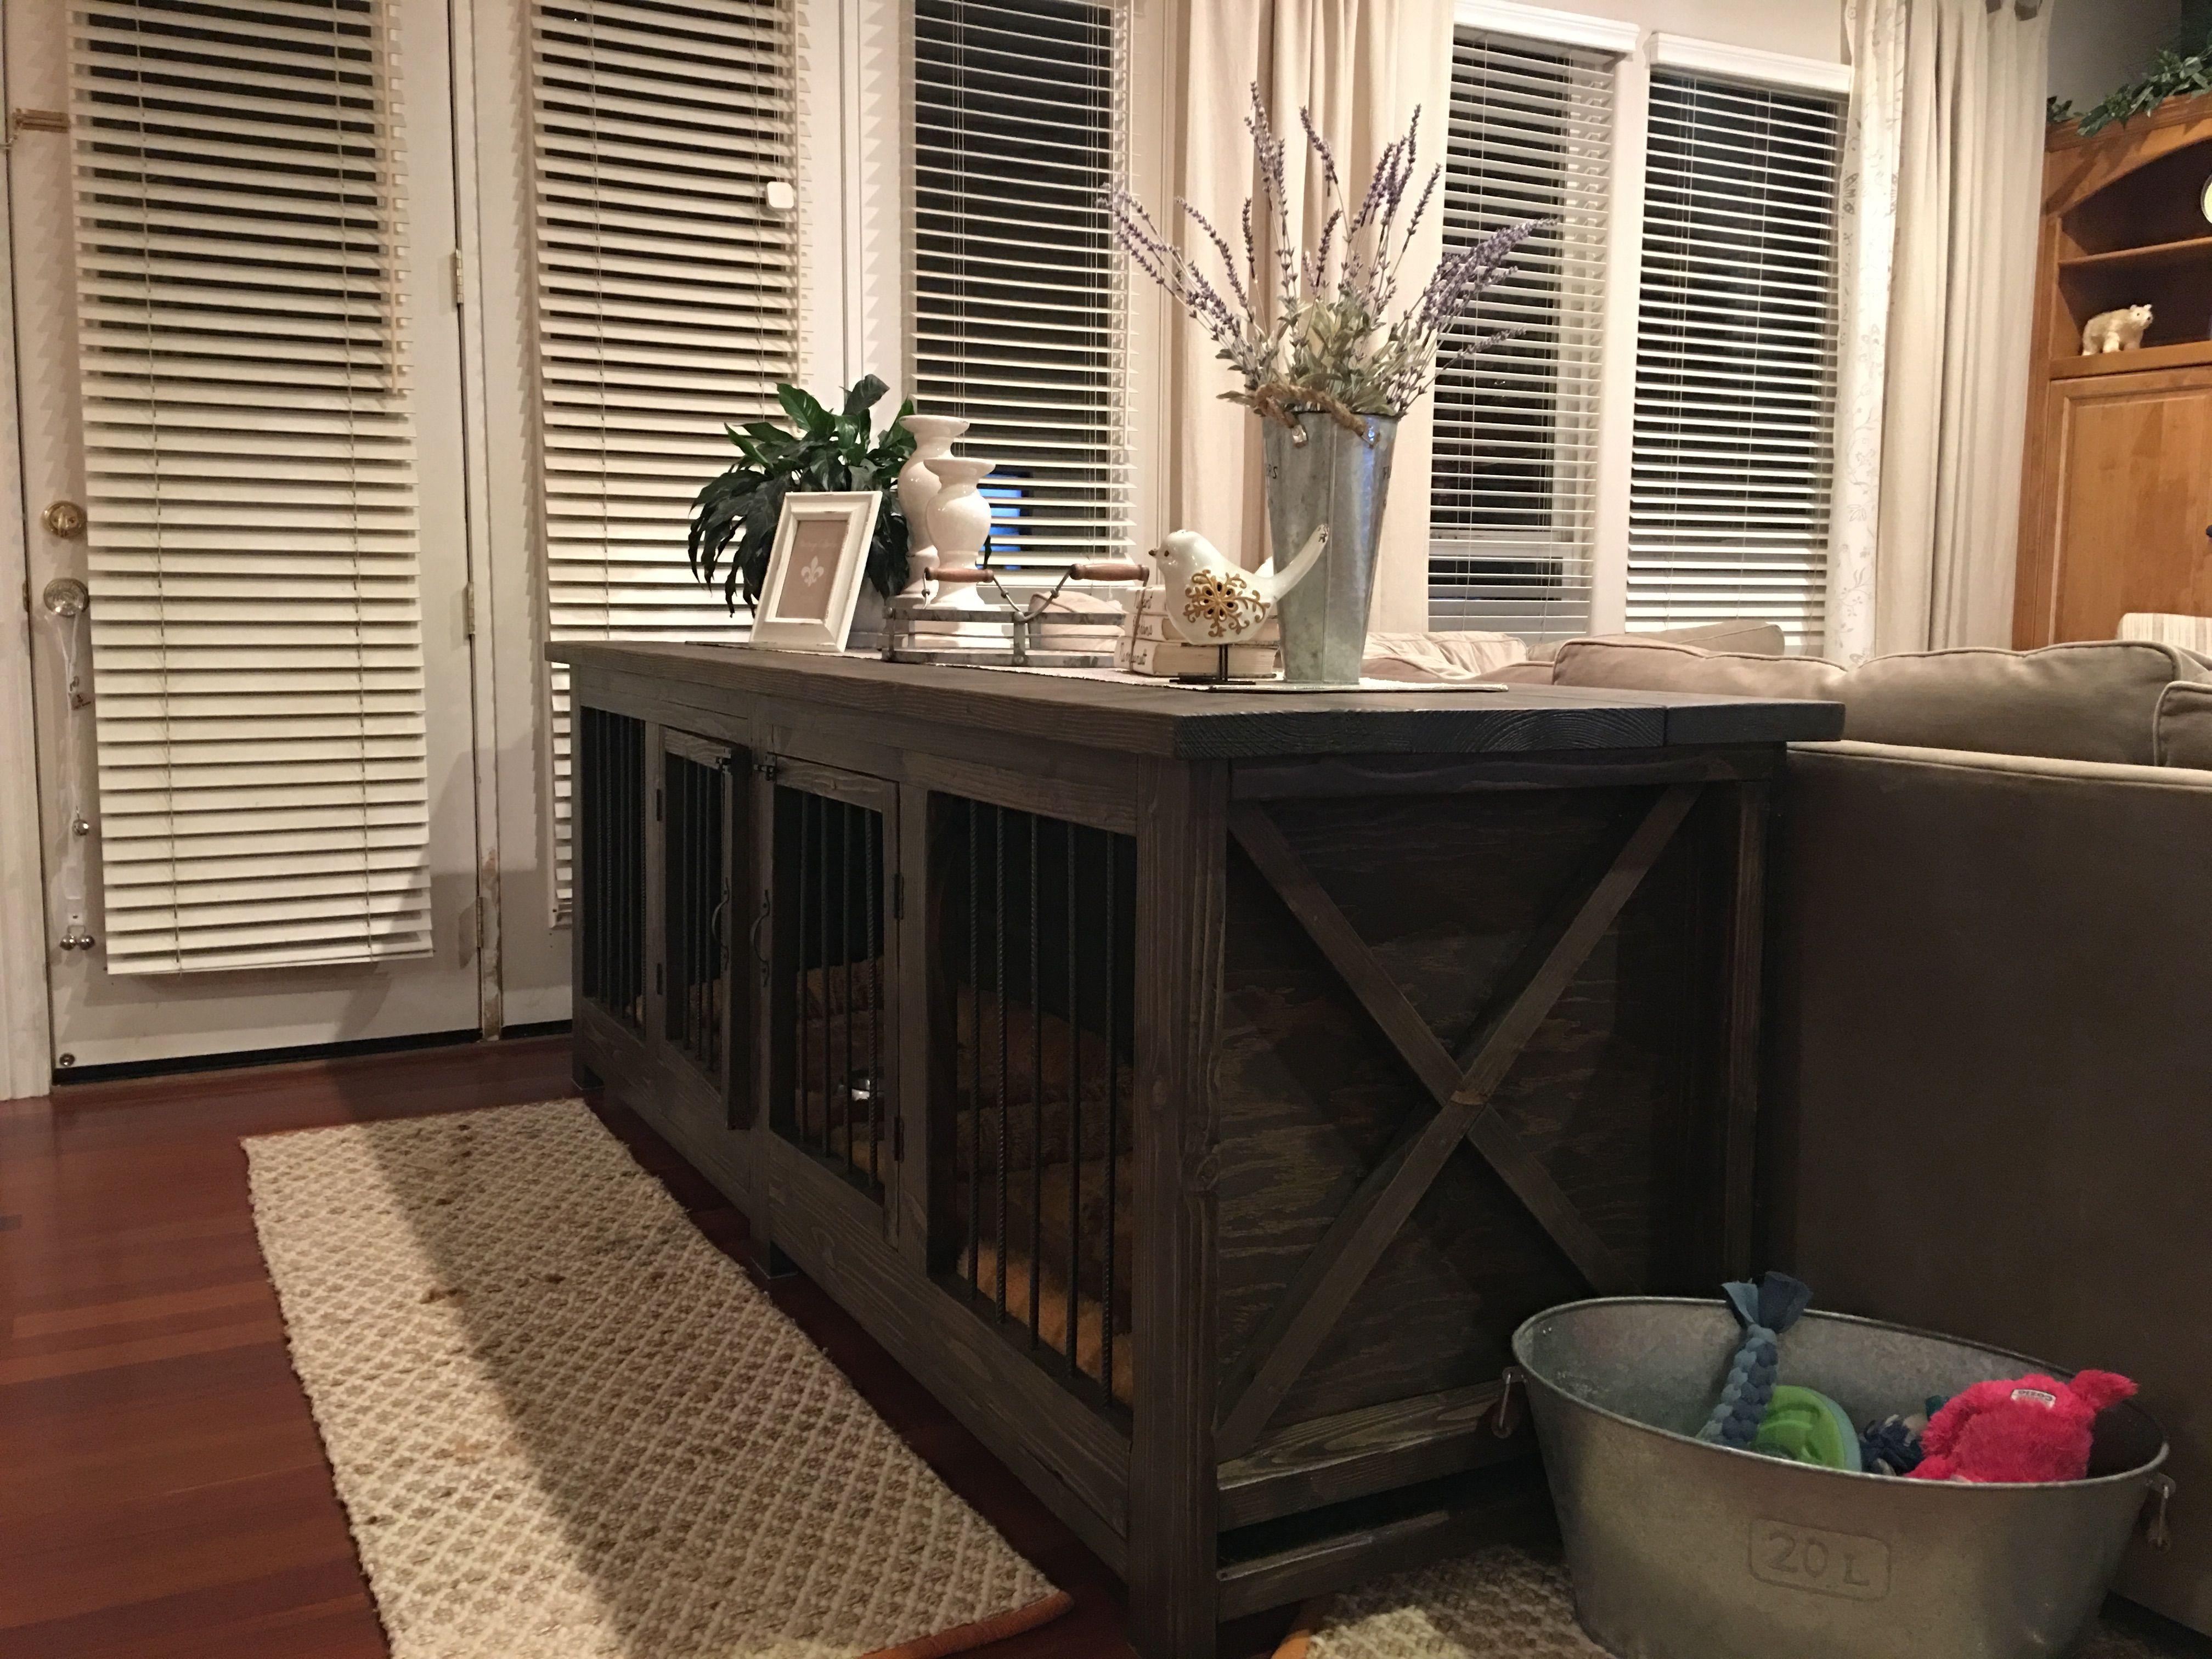 Farmhouse Dog crate/Sofa table. Don't like metal dog